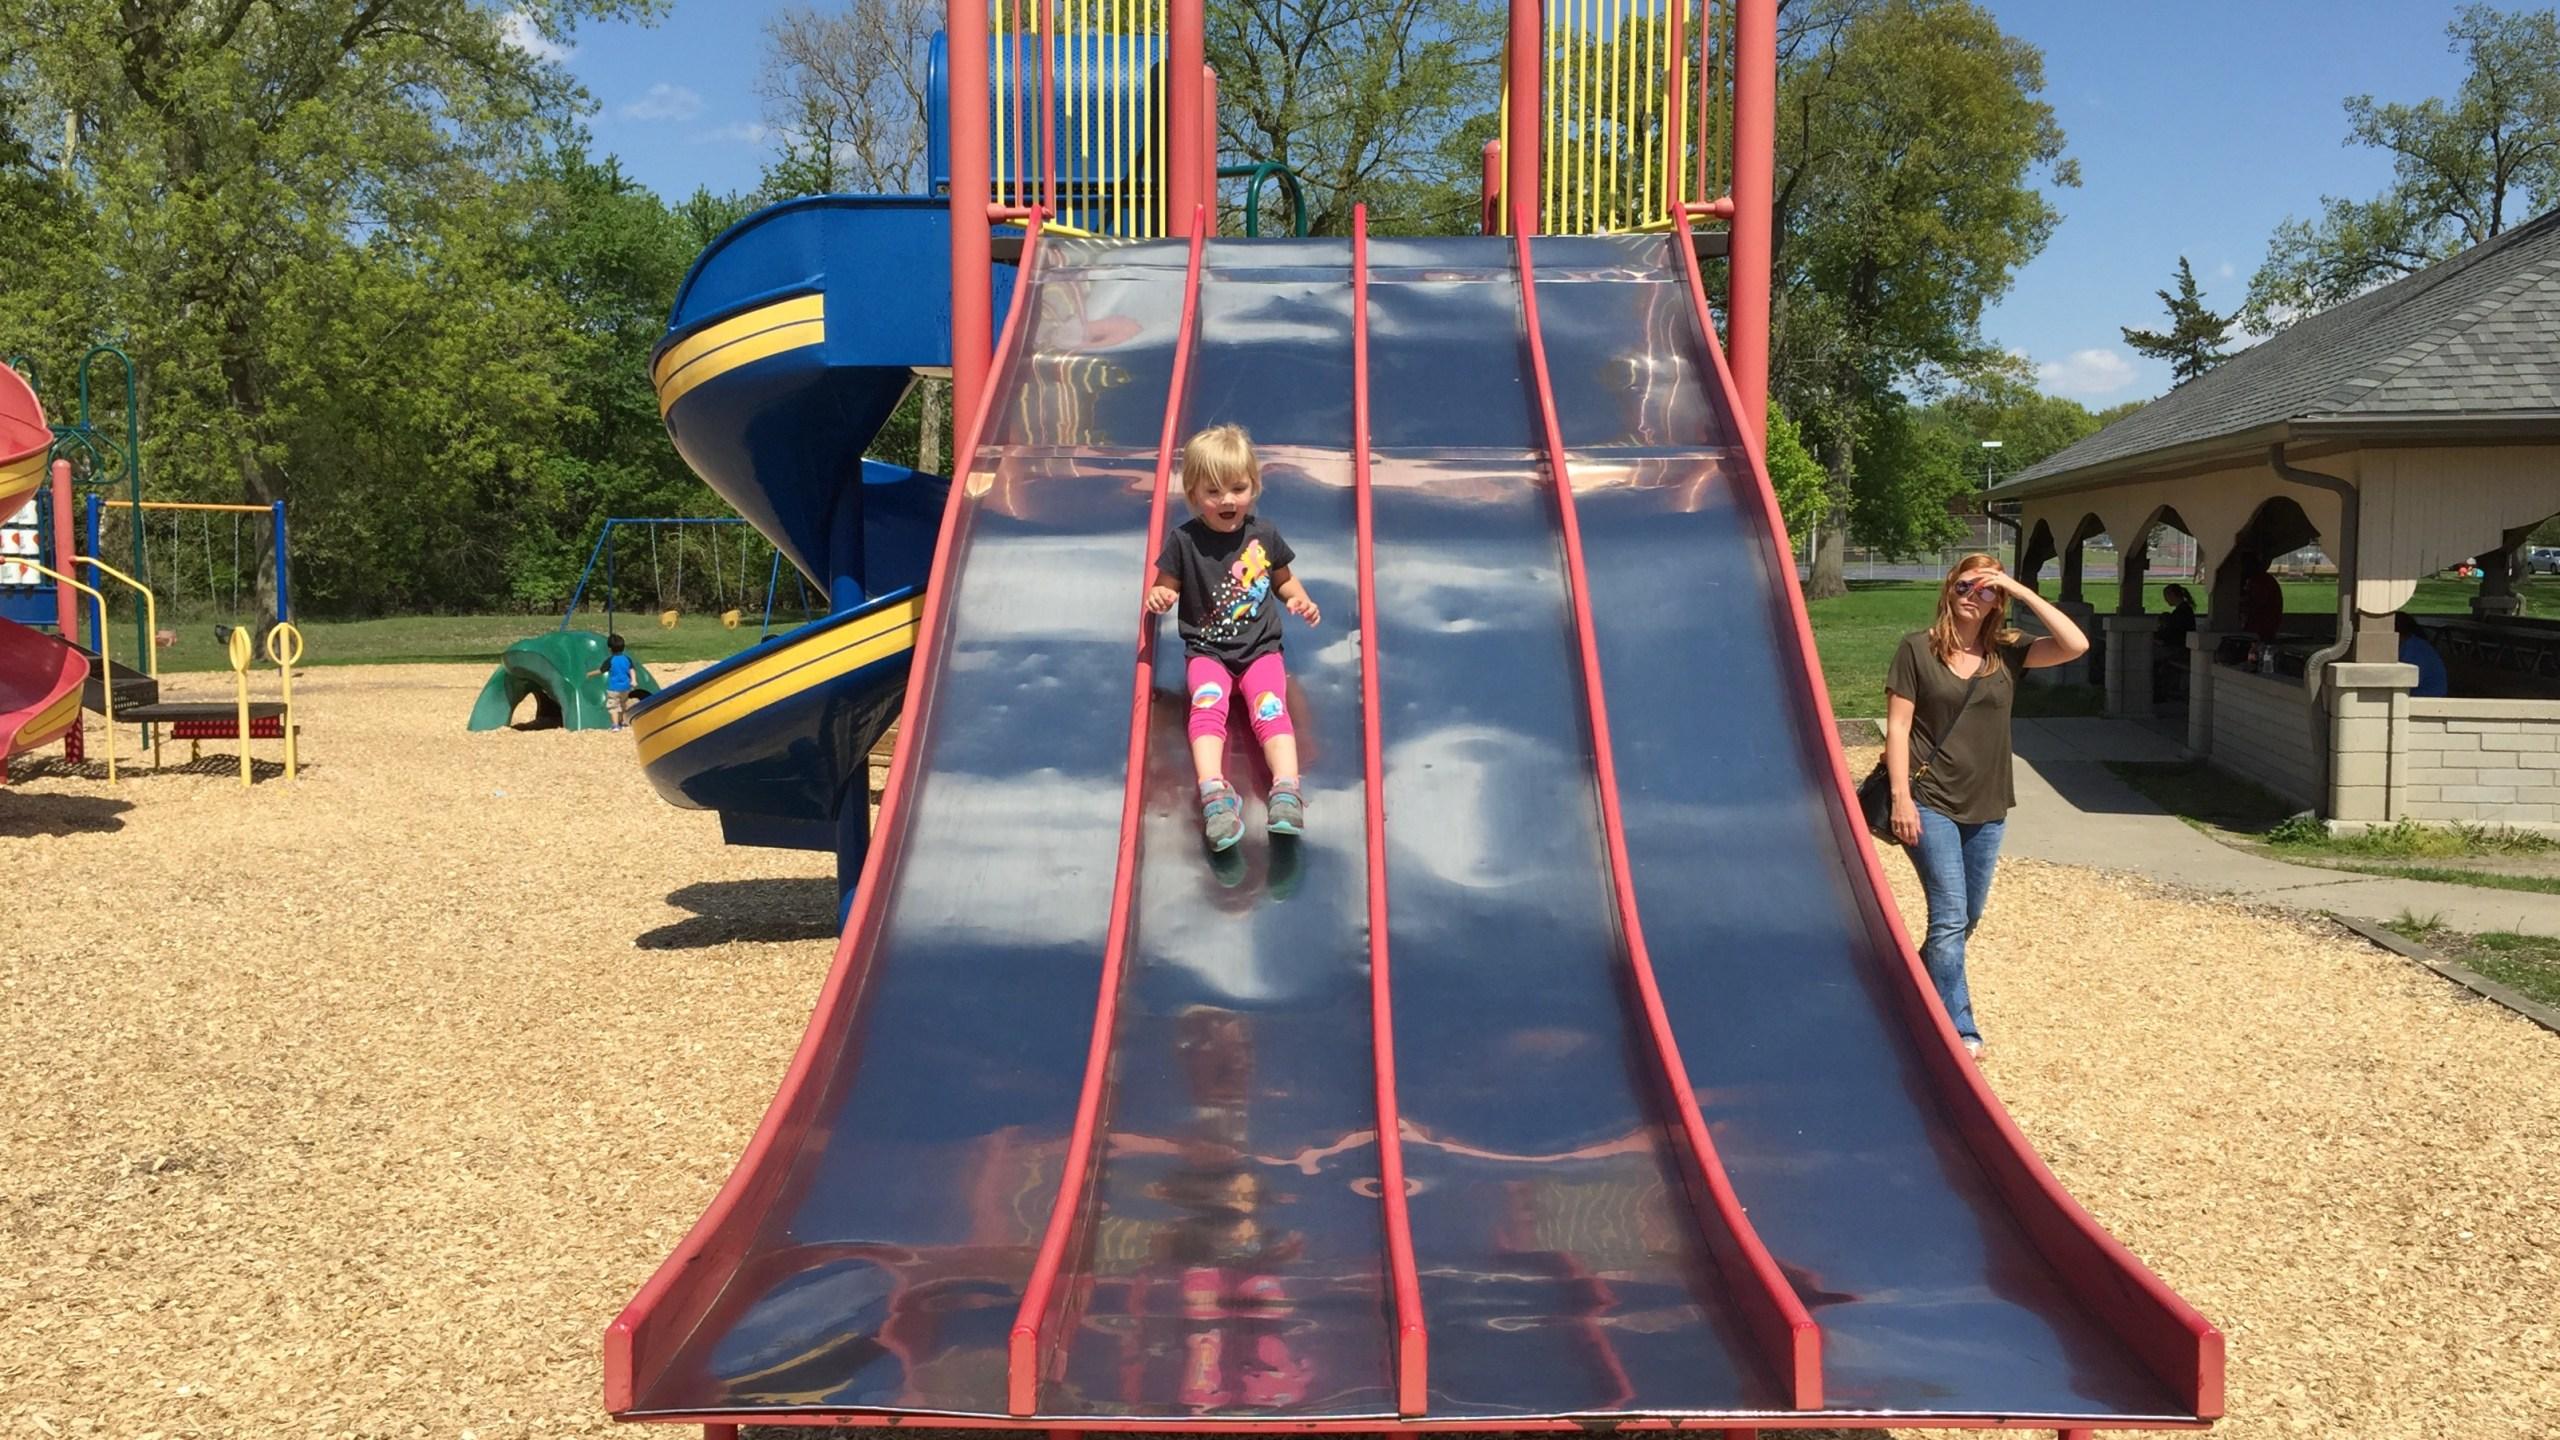 Park playground Fort Wayne Foster Park_261300